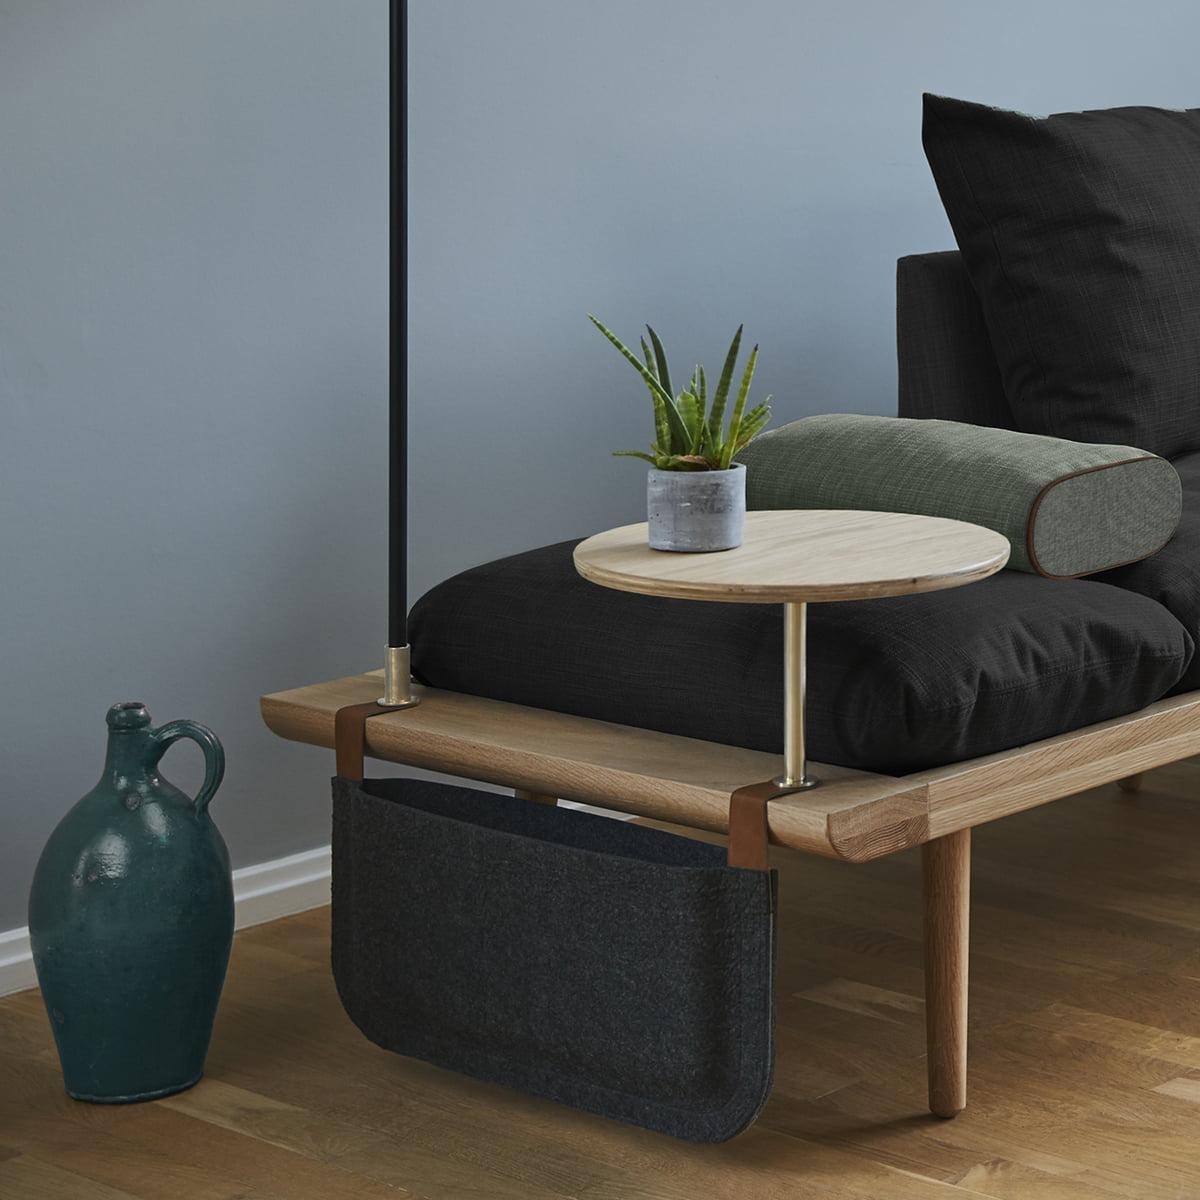 sofatasche lounge around sofa umage. Black Bedroom Furniture Sets. Home Design Ideas